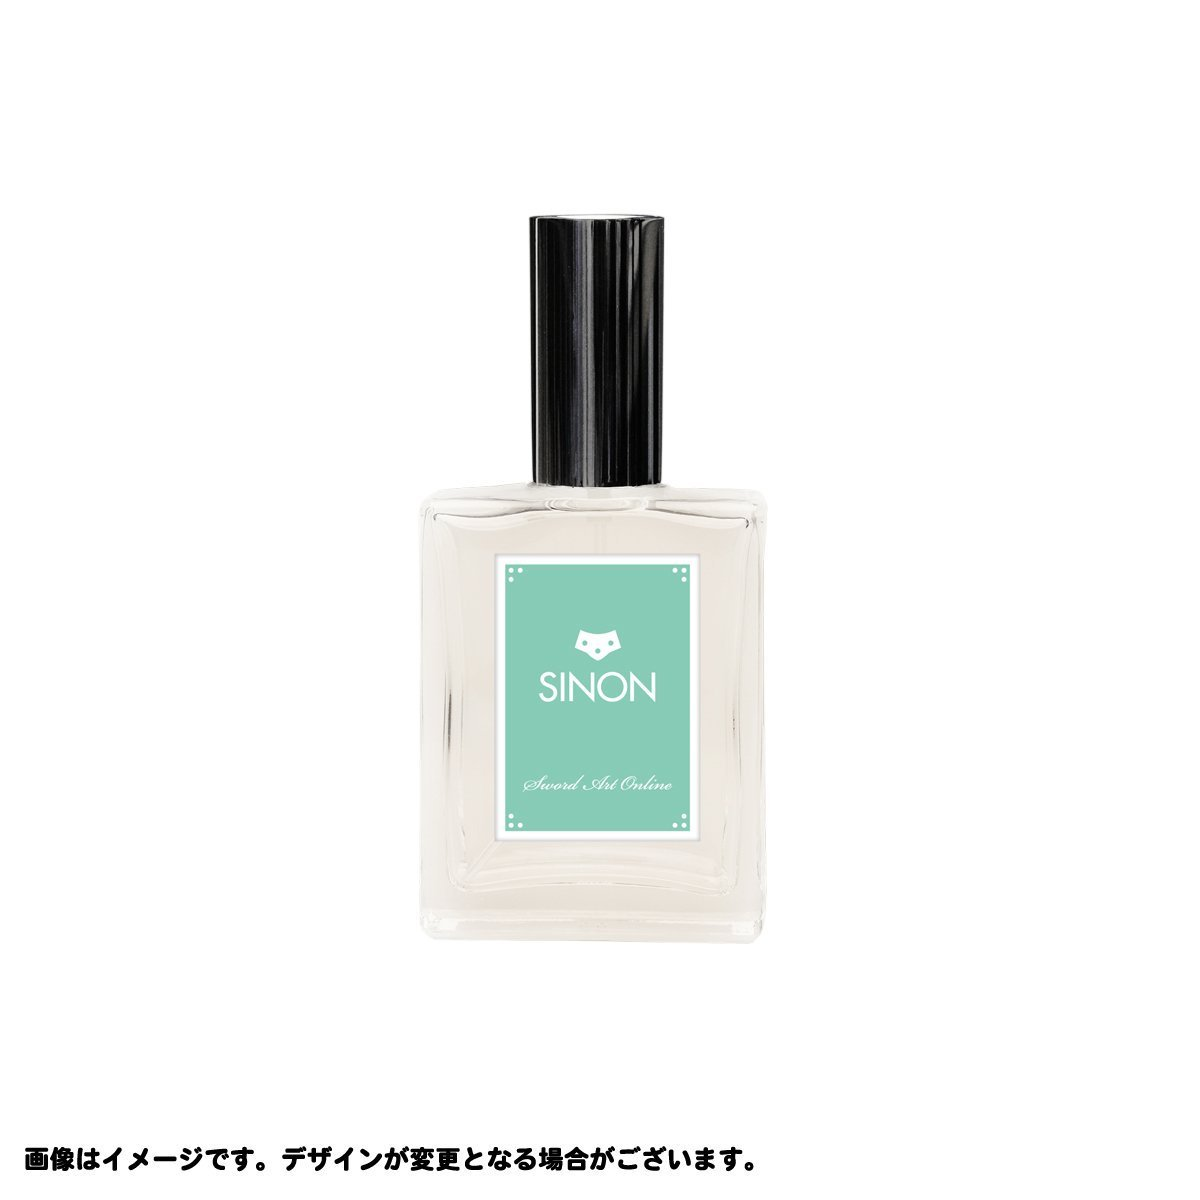 NEW Sword Art Online Sao Japan Anime Perfume fragrance Sinon JP Limited Rare